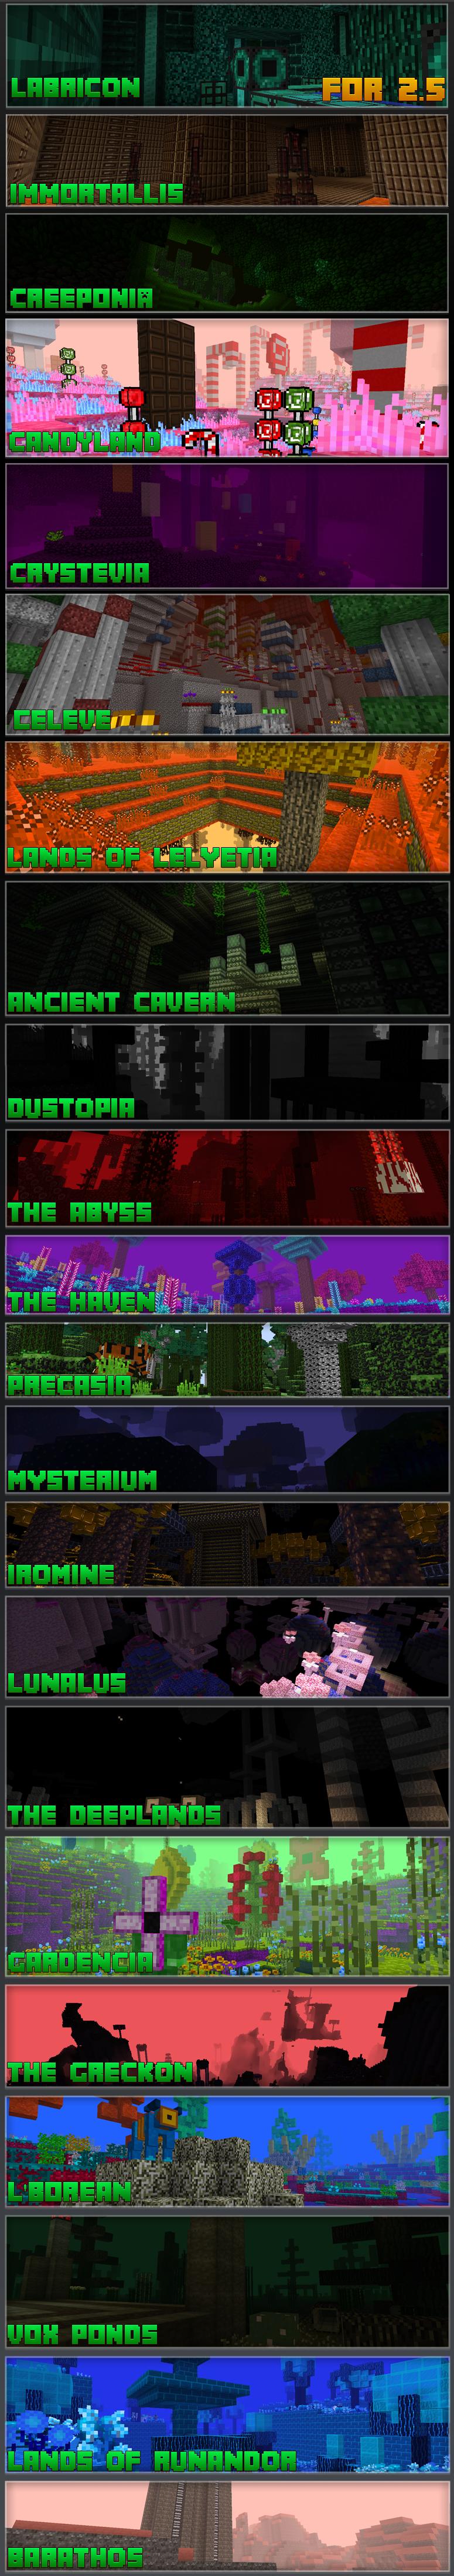 Qwertygiy's Profile - Member List - Minecraft Forum